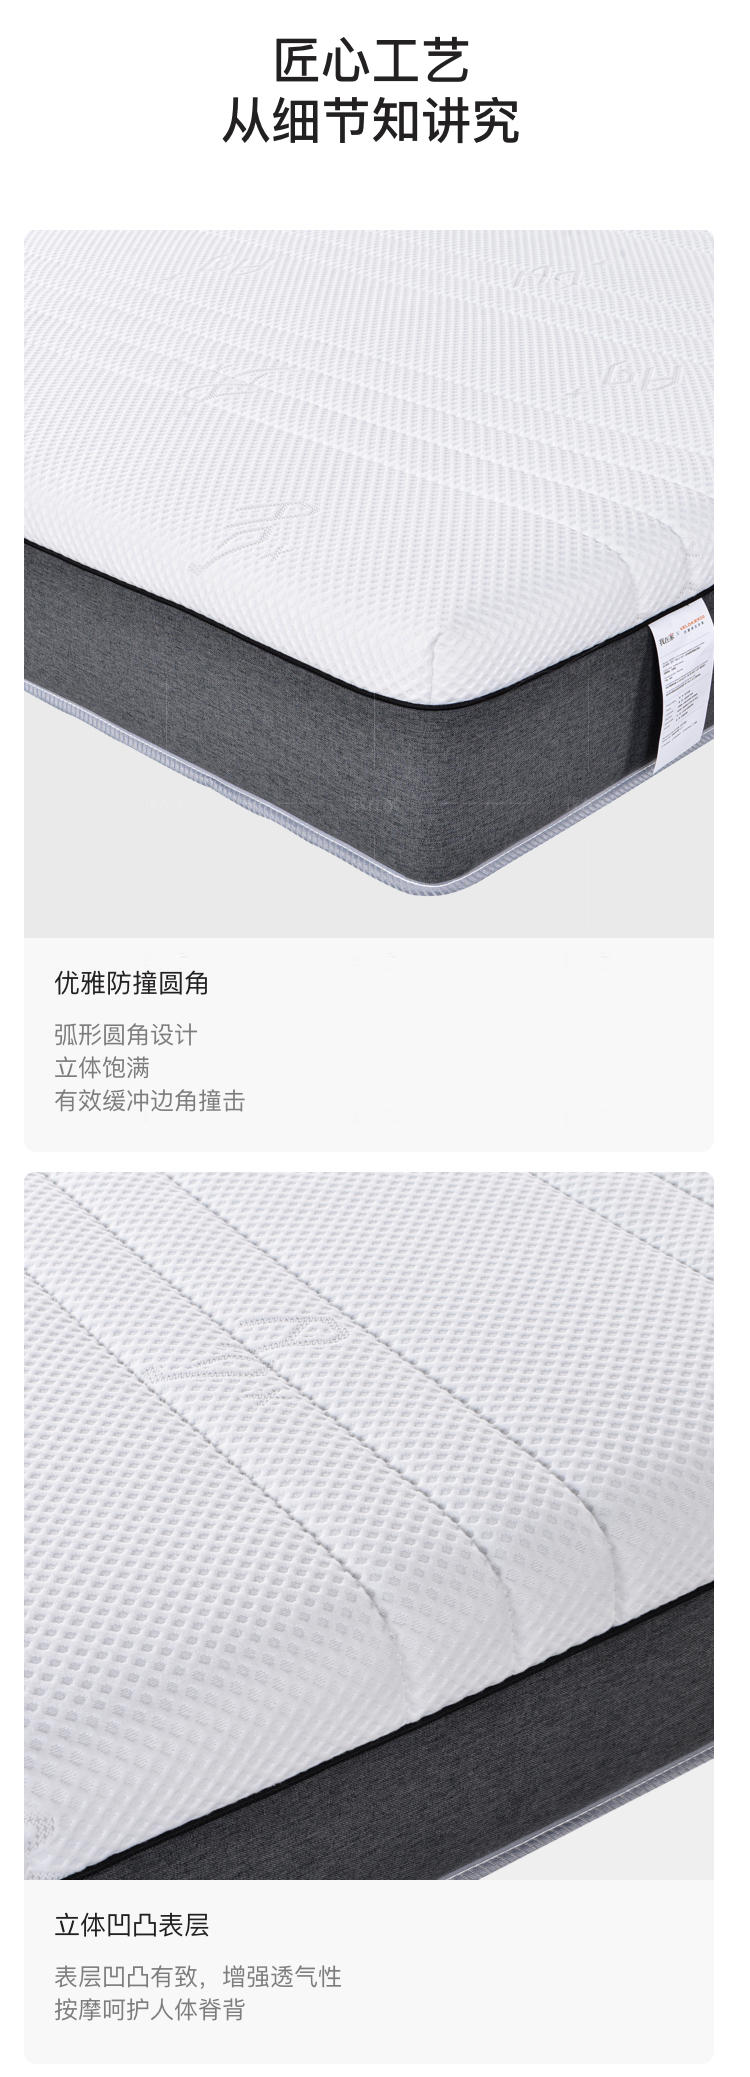 VELDA系列尼古拉斯乳胶床垫的详细介绍